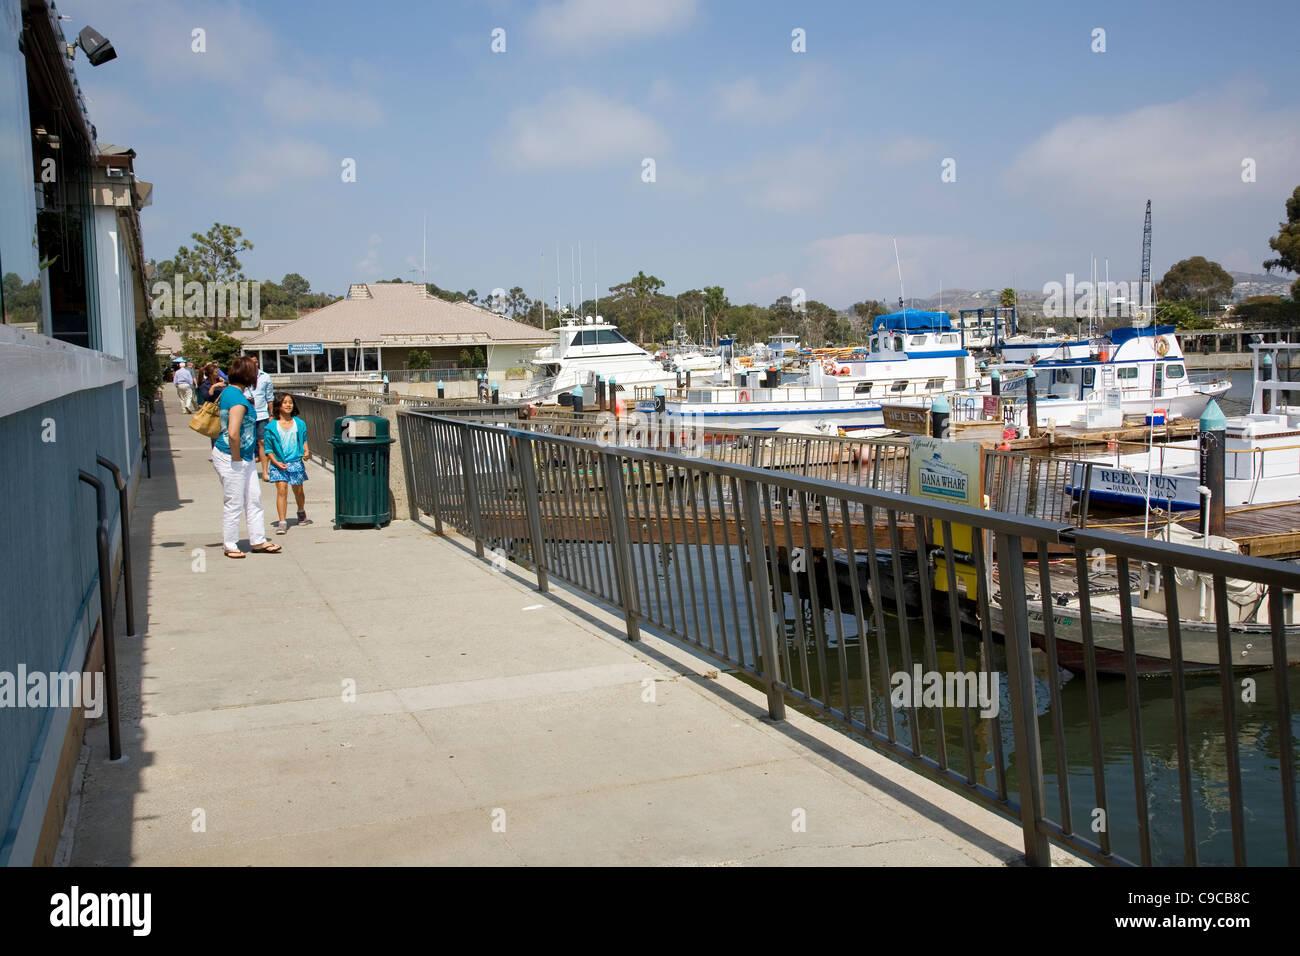 Dana Point harbor Wharf - California - Stock Image